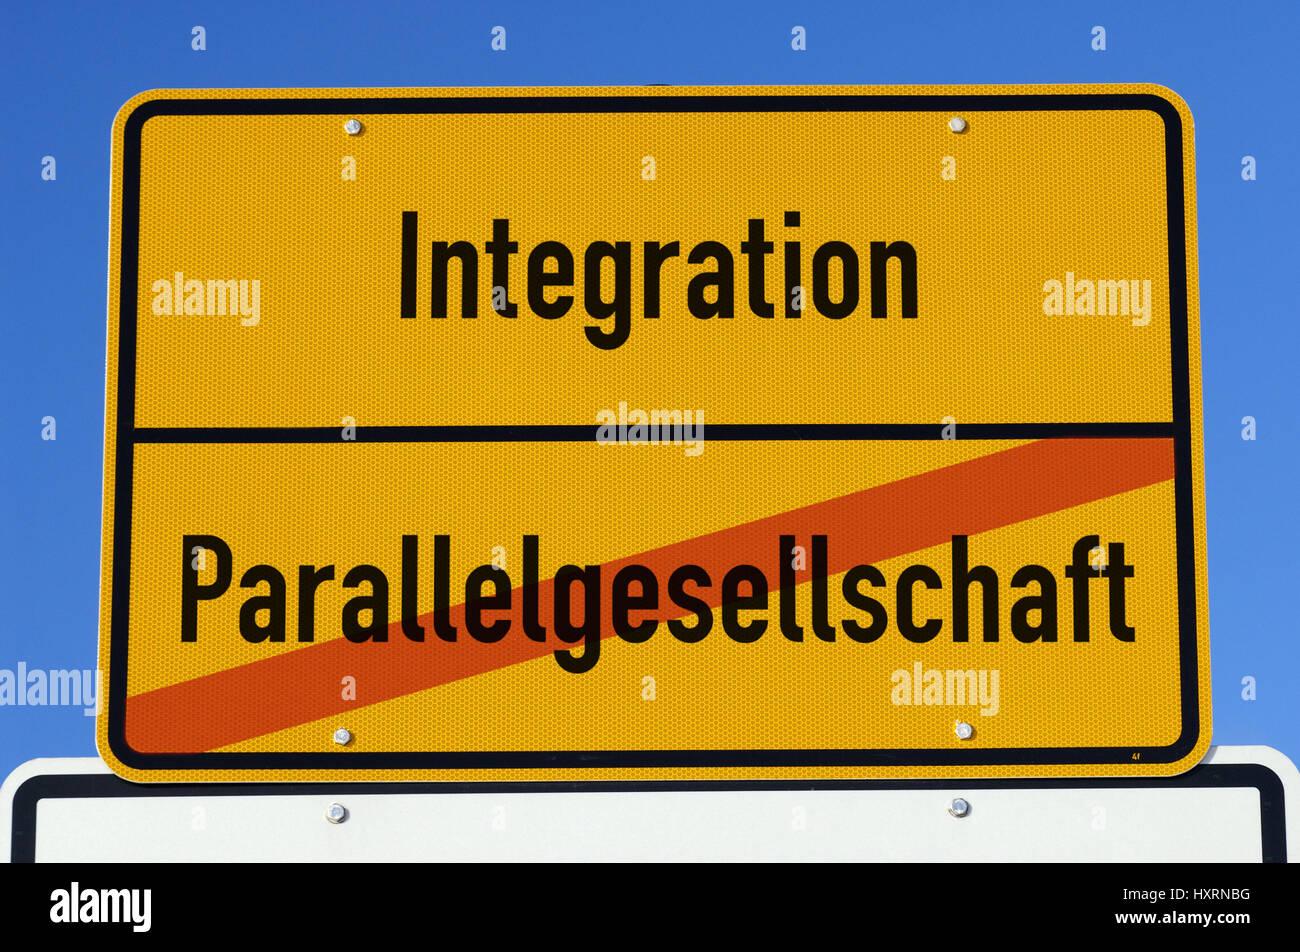 Local sign with label Integration and Parallel society, Ortsschild mit Aufschrift Integration und Parallelgesellschaft - Stock Image